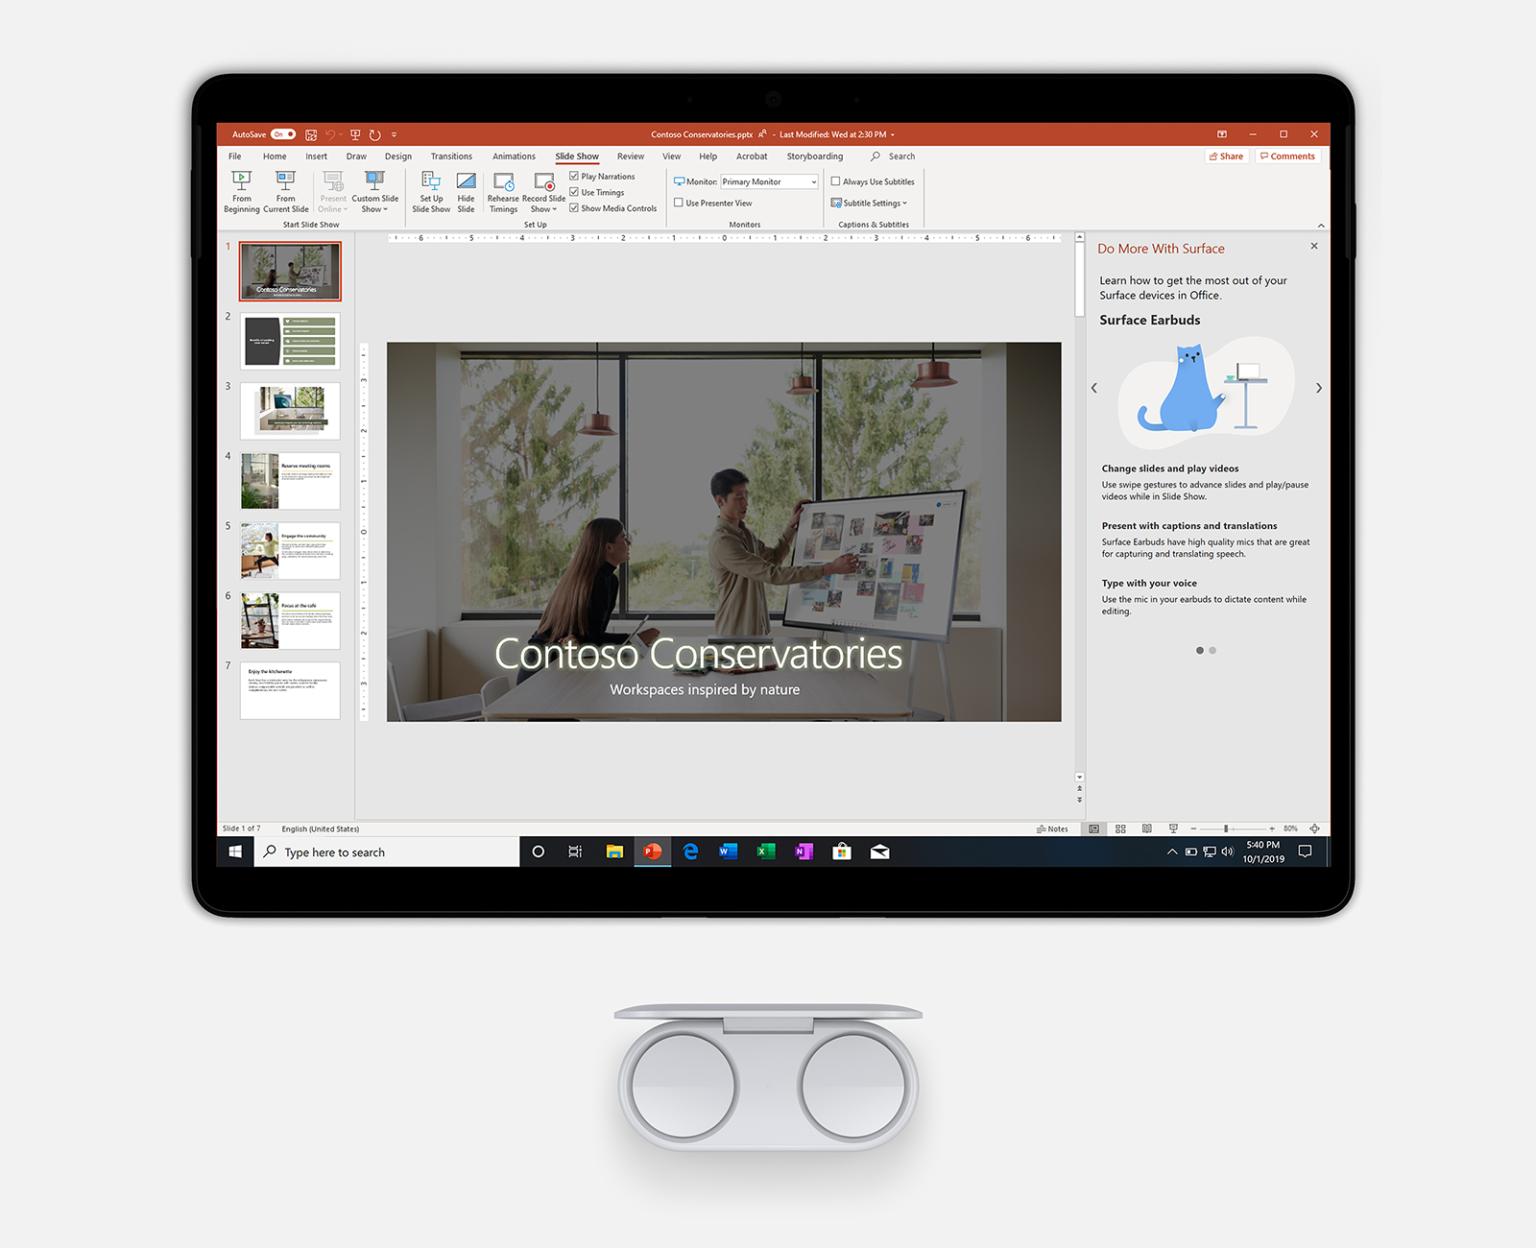 PowerPoint가 표시된 Surface Pro 7과 이어버드 이미지.